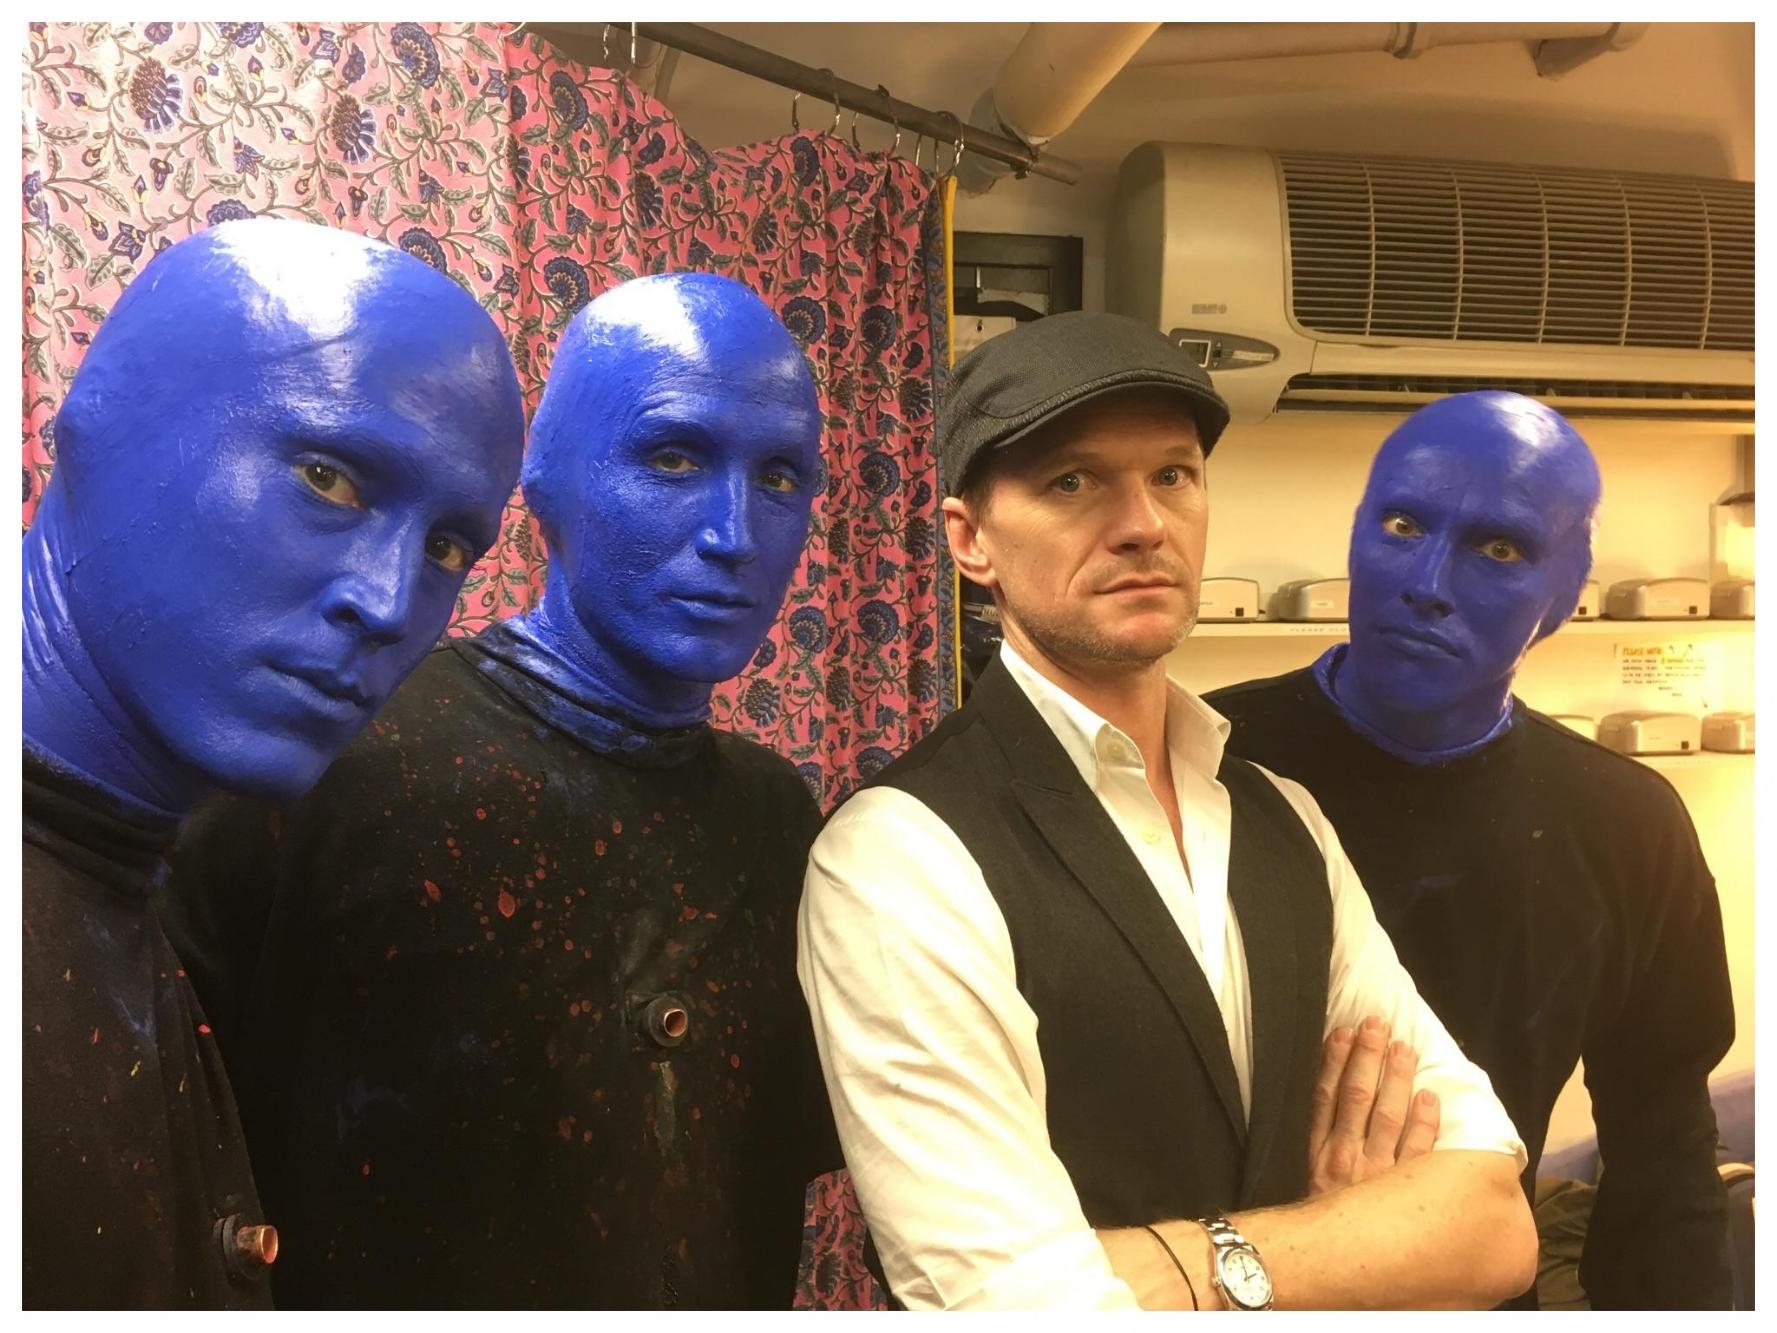 Blue Man (left)